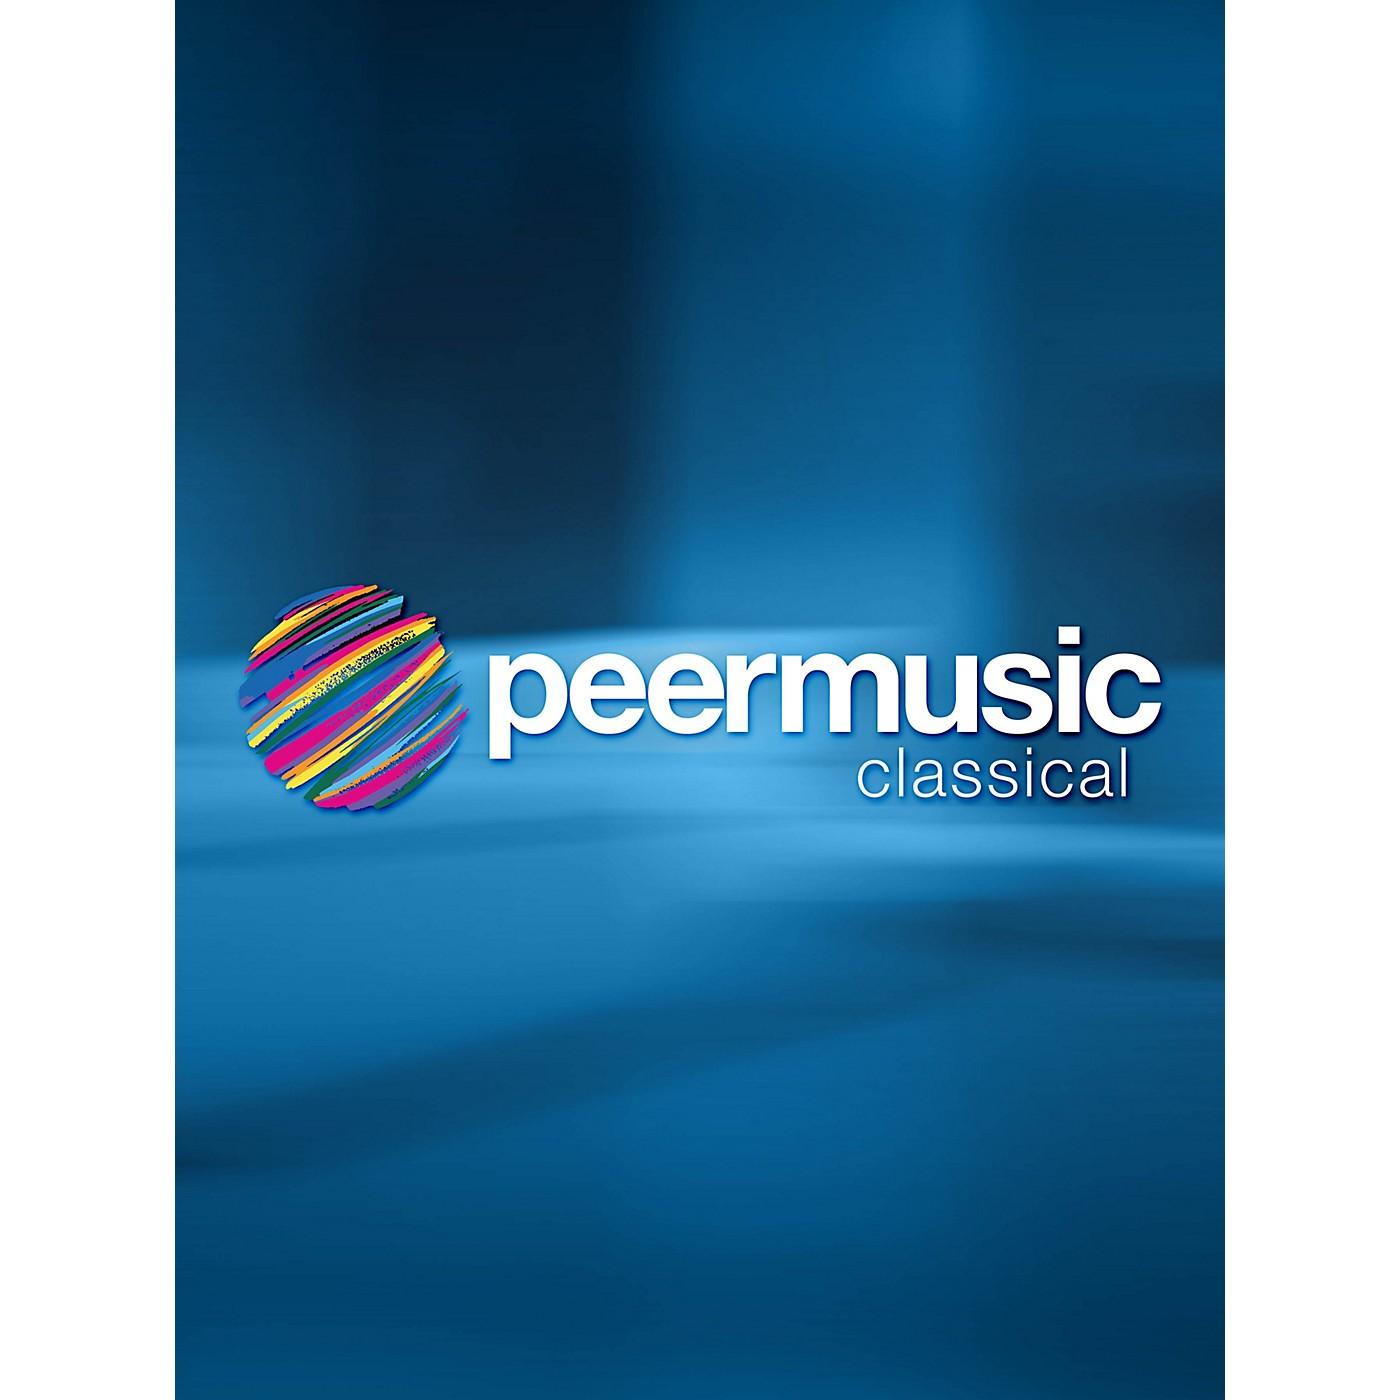 Peer Music Tango in Blue (Saxophone Quartet, Score and Parts) Peermusic Classical Series Book by Jose Serebrier thumbnail